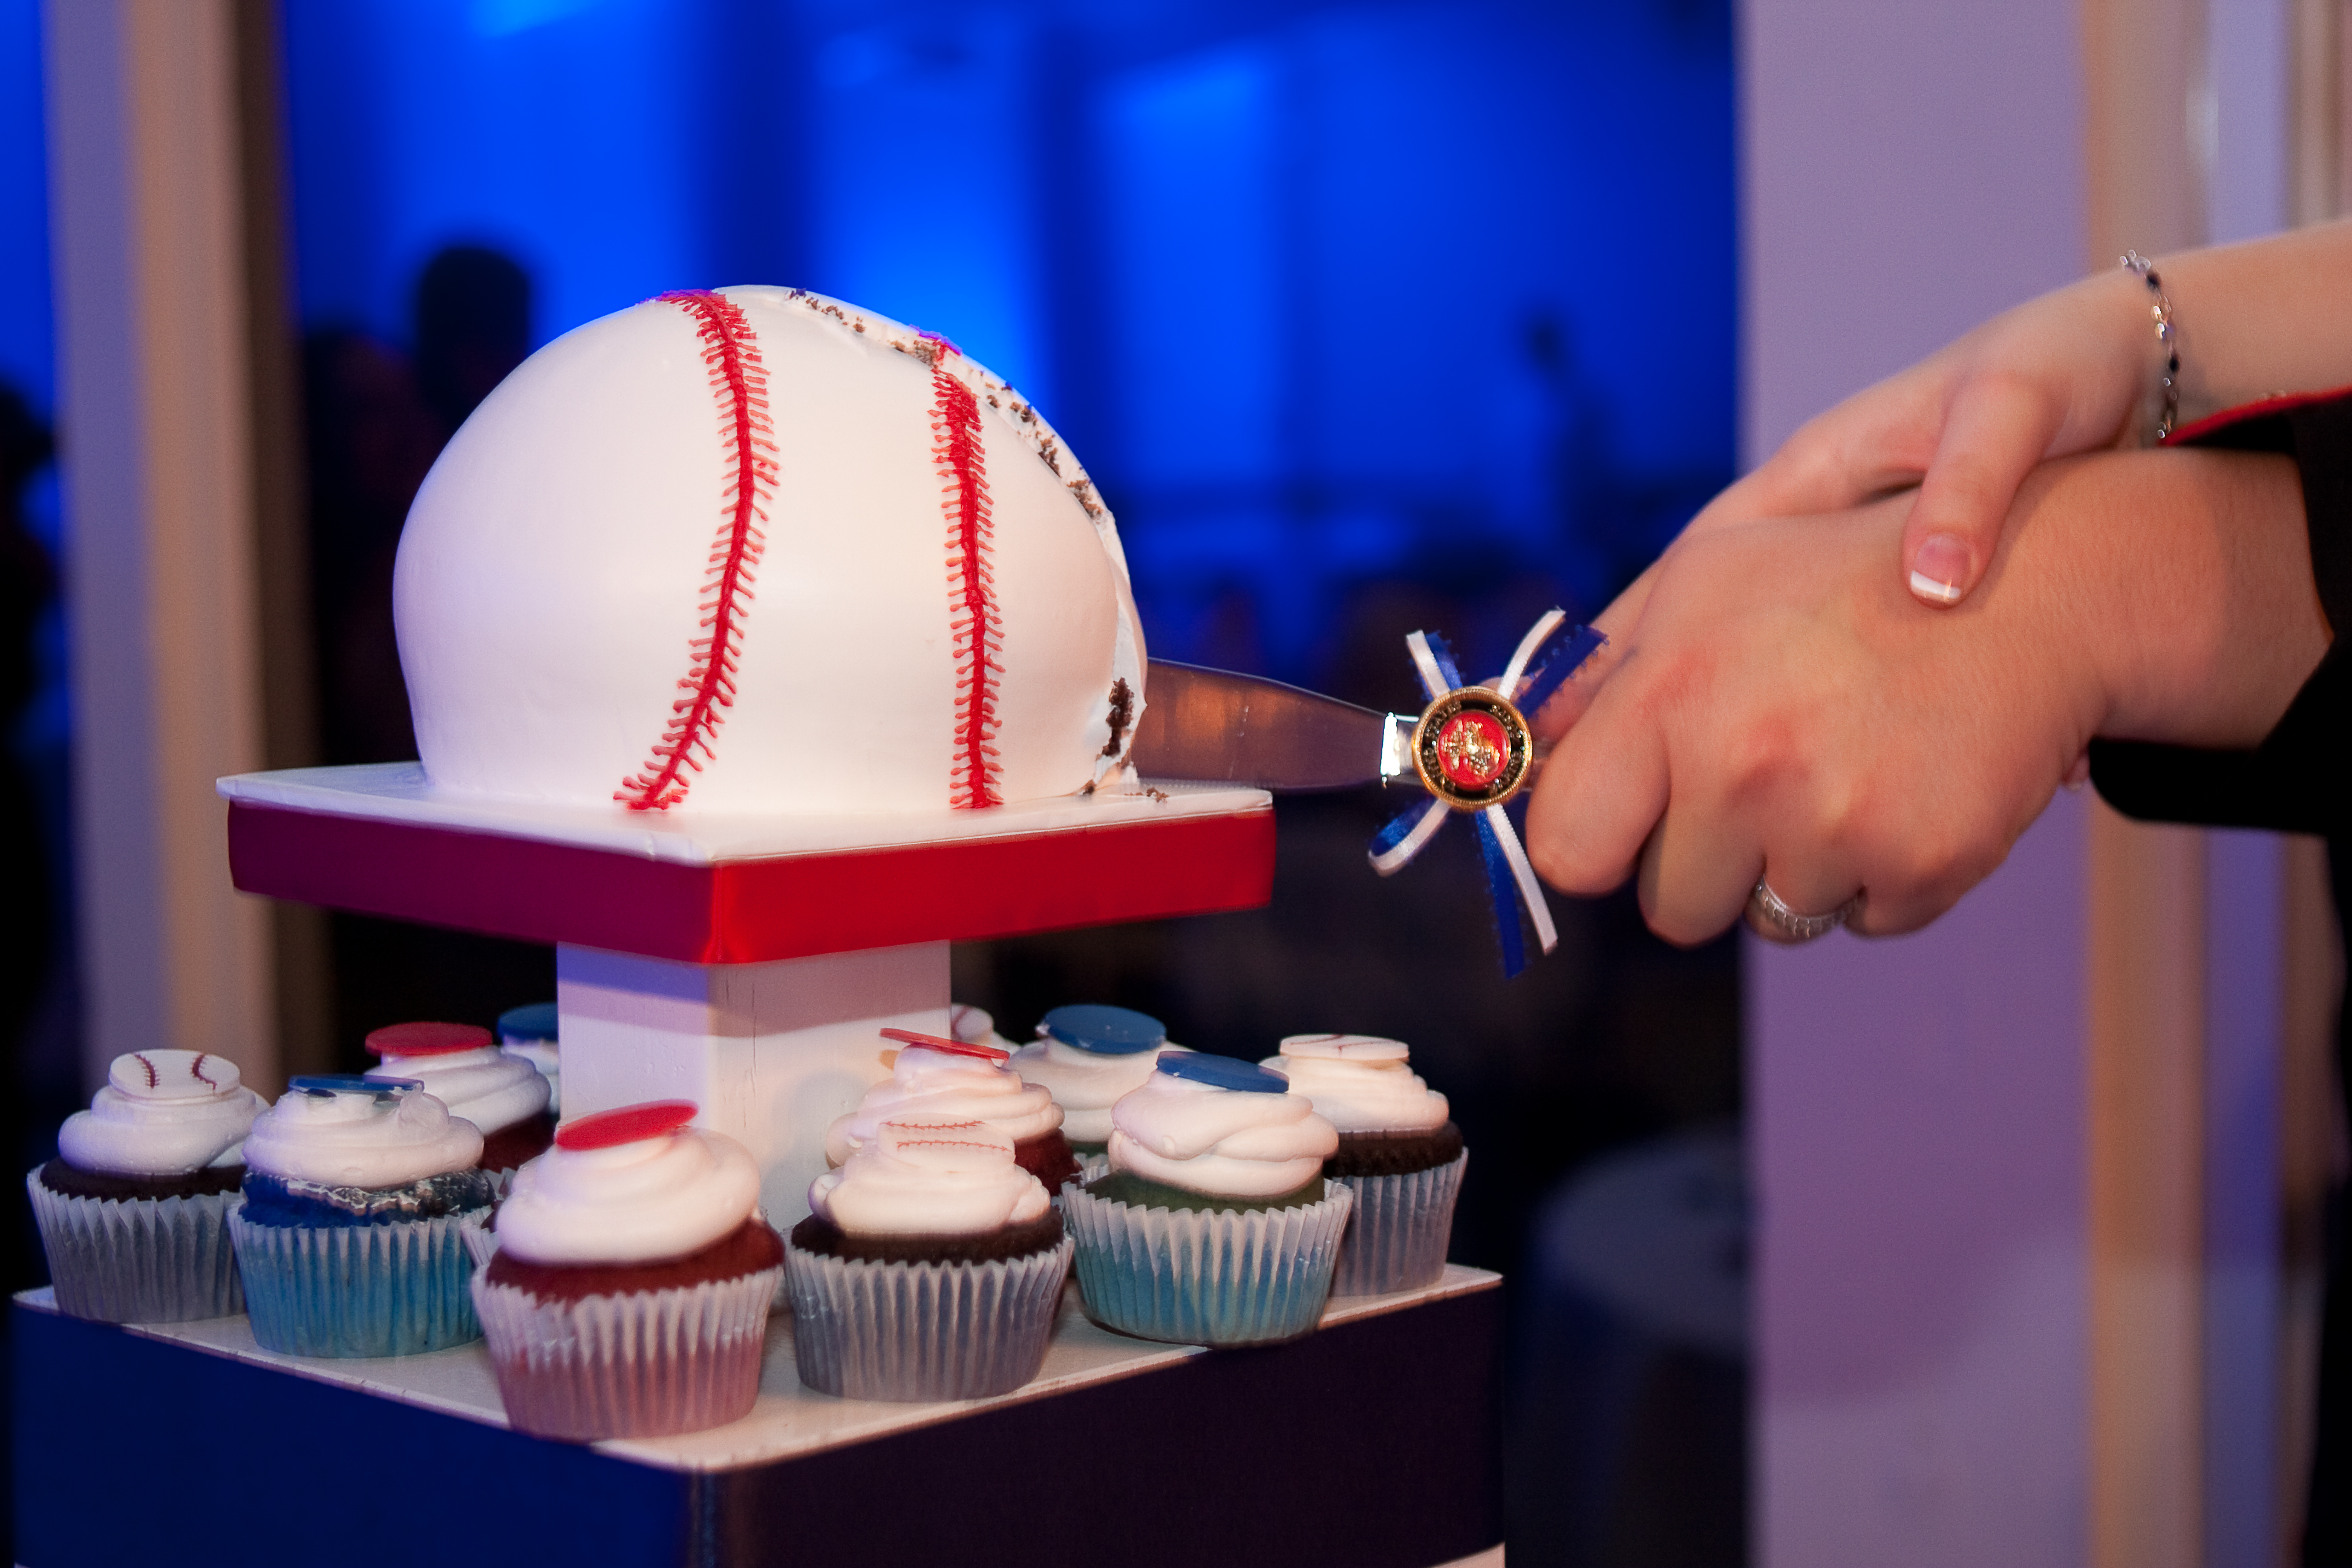 Reception, Flowers & Decor, Photography, Cakes, blue, cake, Baseball, Cutting, Hollis, Cari